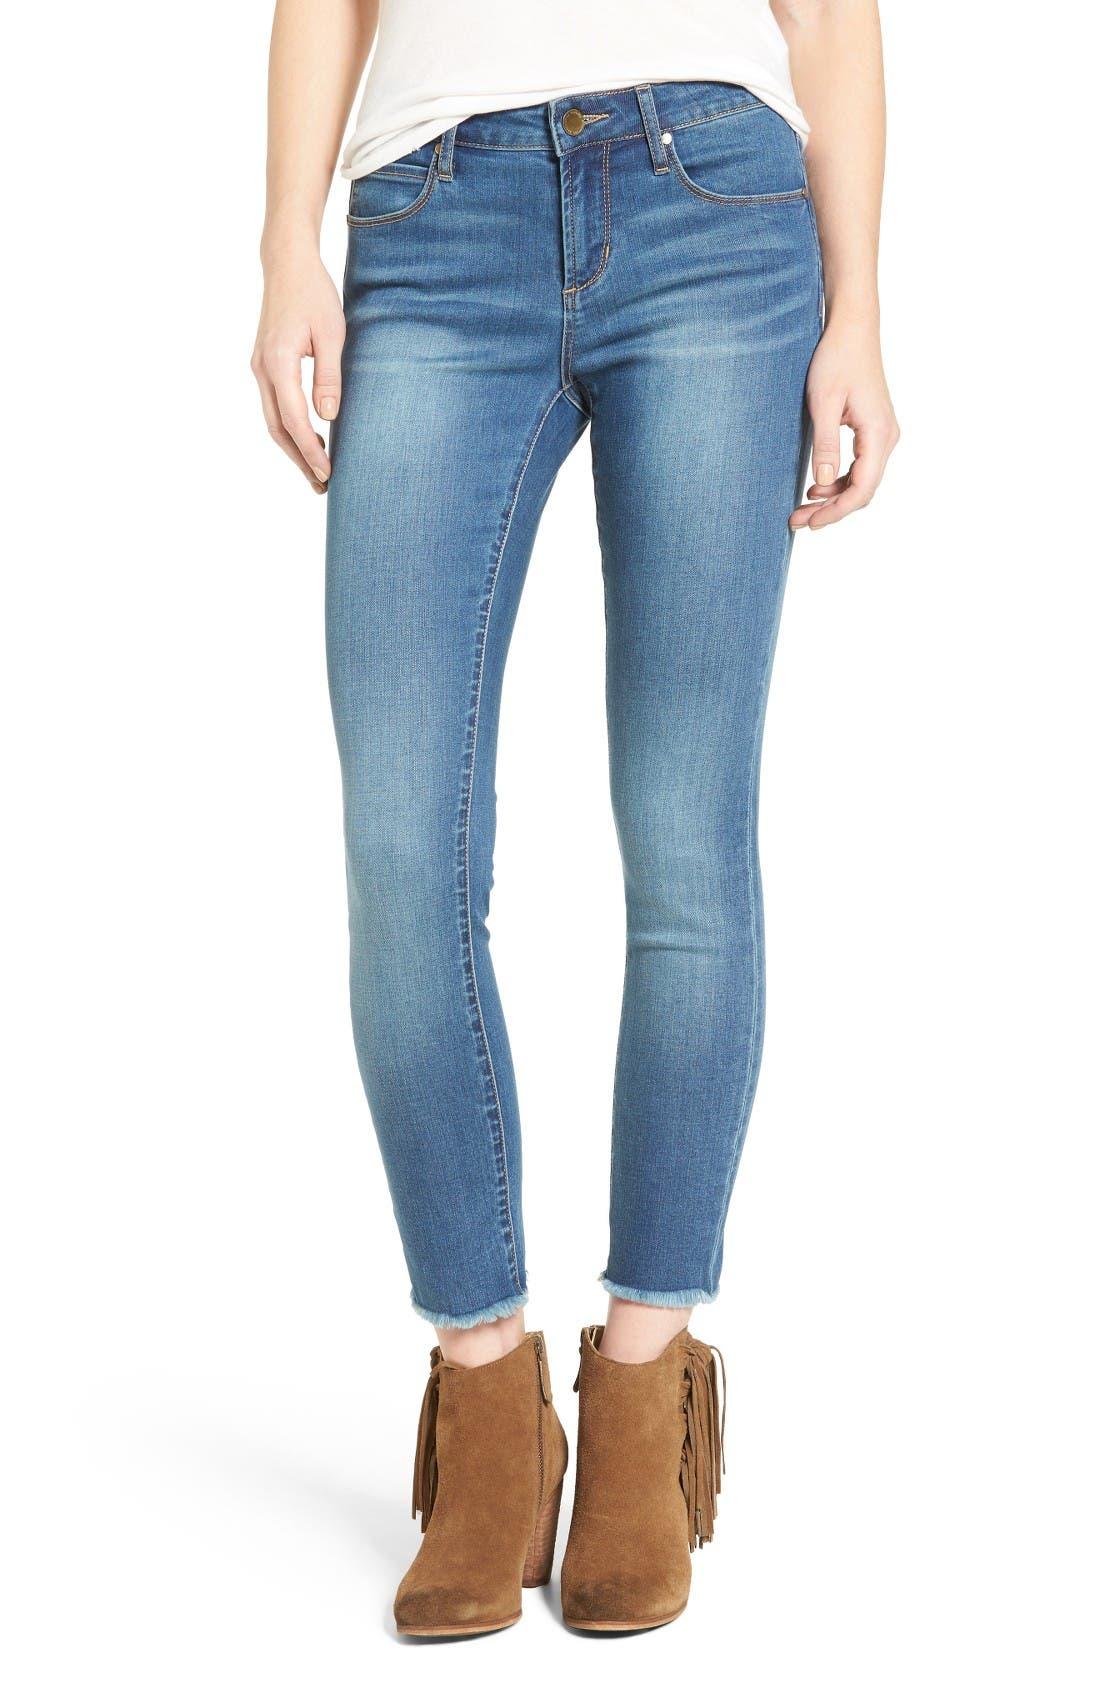 Light blue ankle skinny jeans